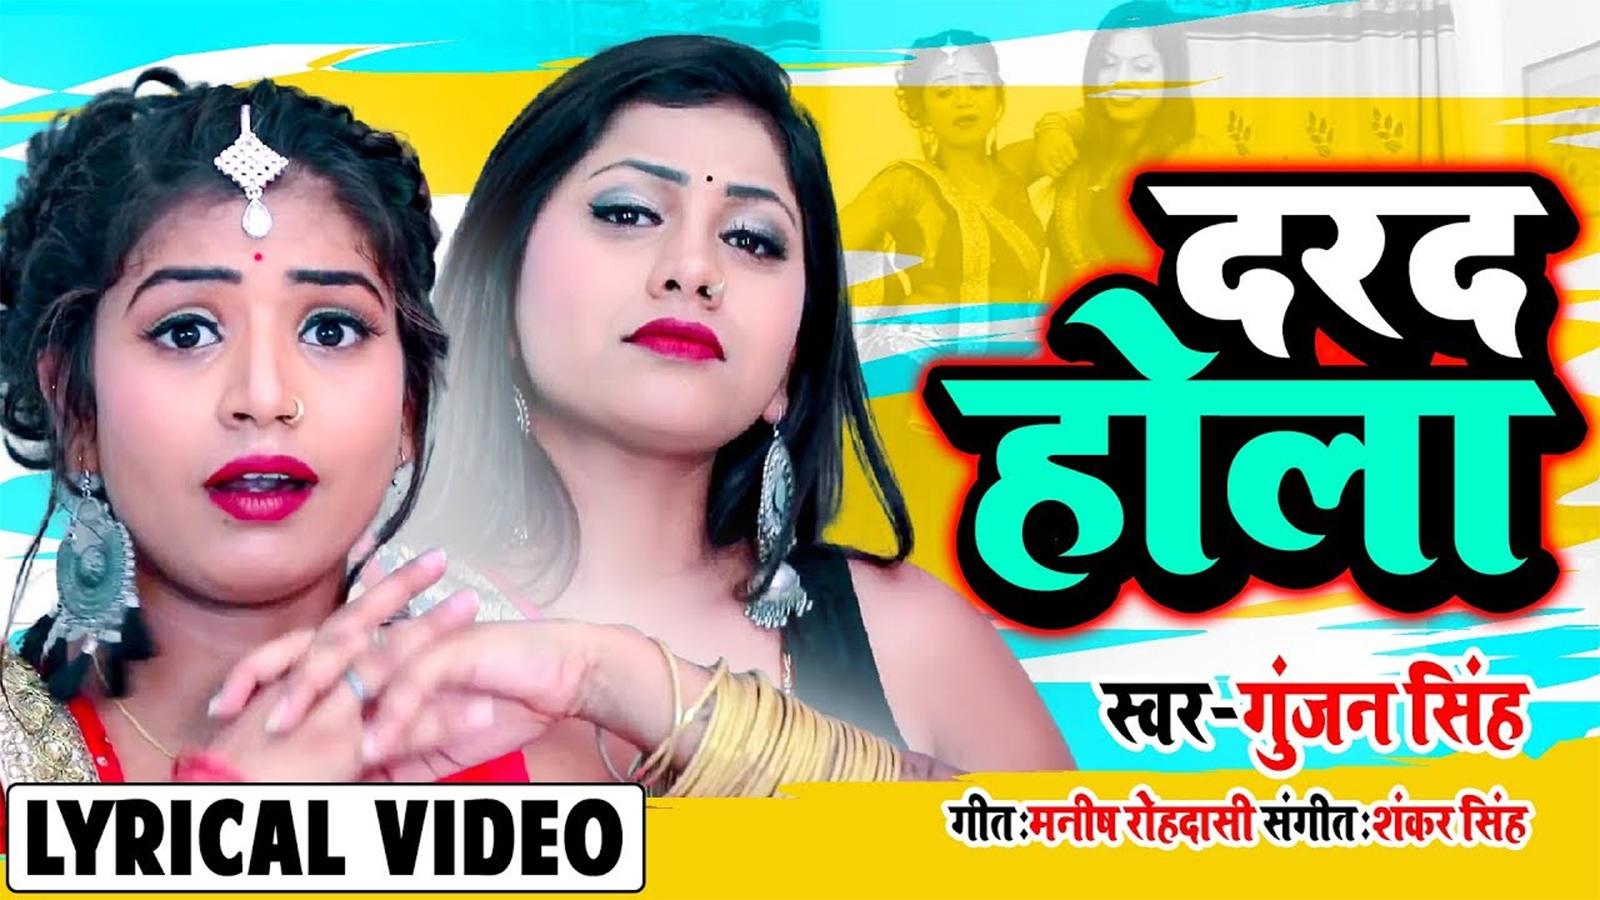 Latest Bhojpuri Song 'Dard Hola' (Lyrical) Sung By Gunjan Singh |  Entertainment - Times of India Videos